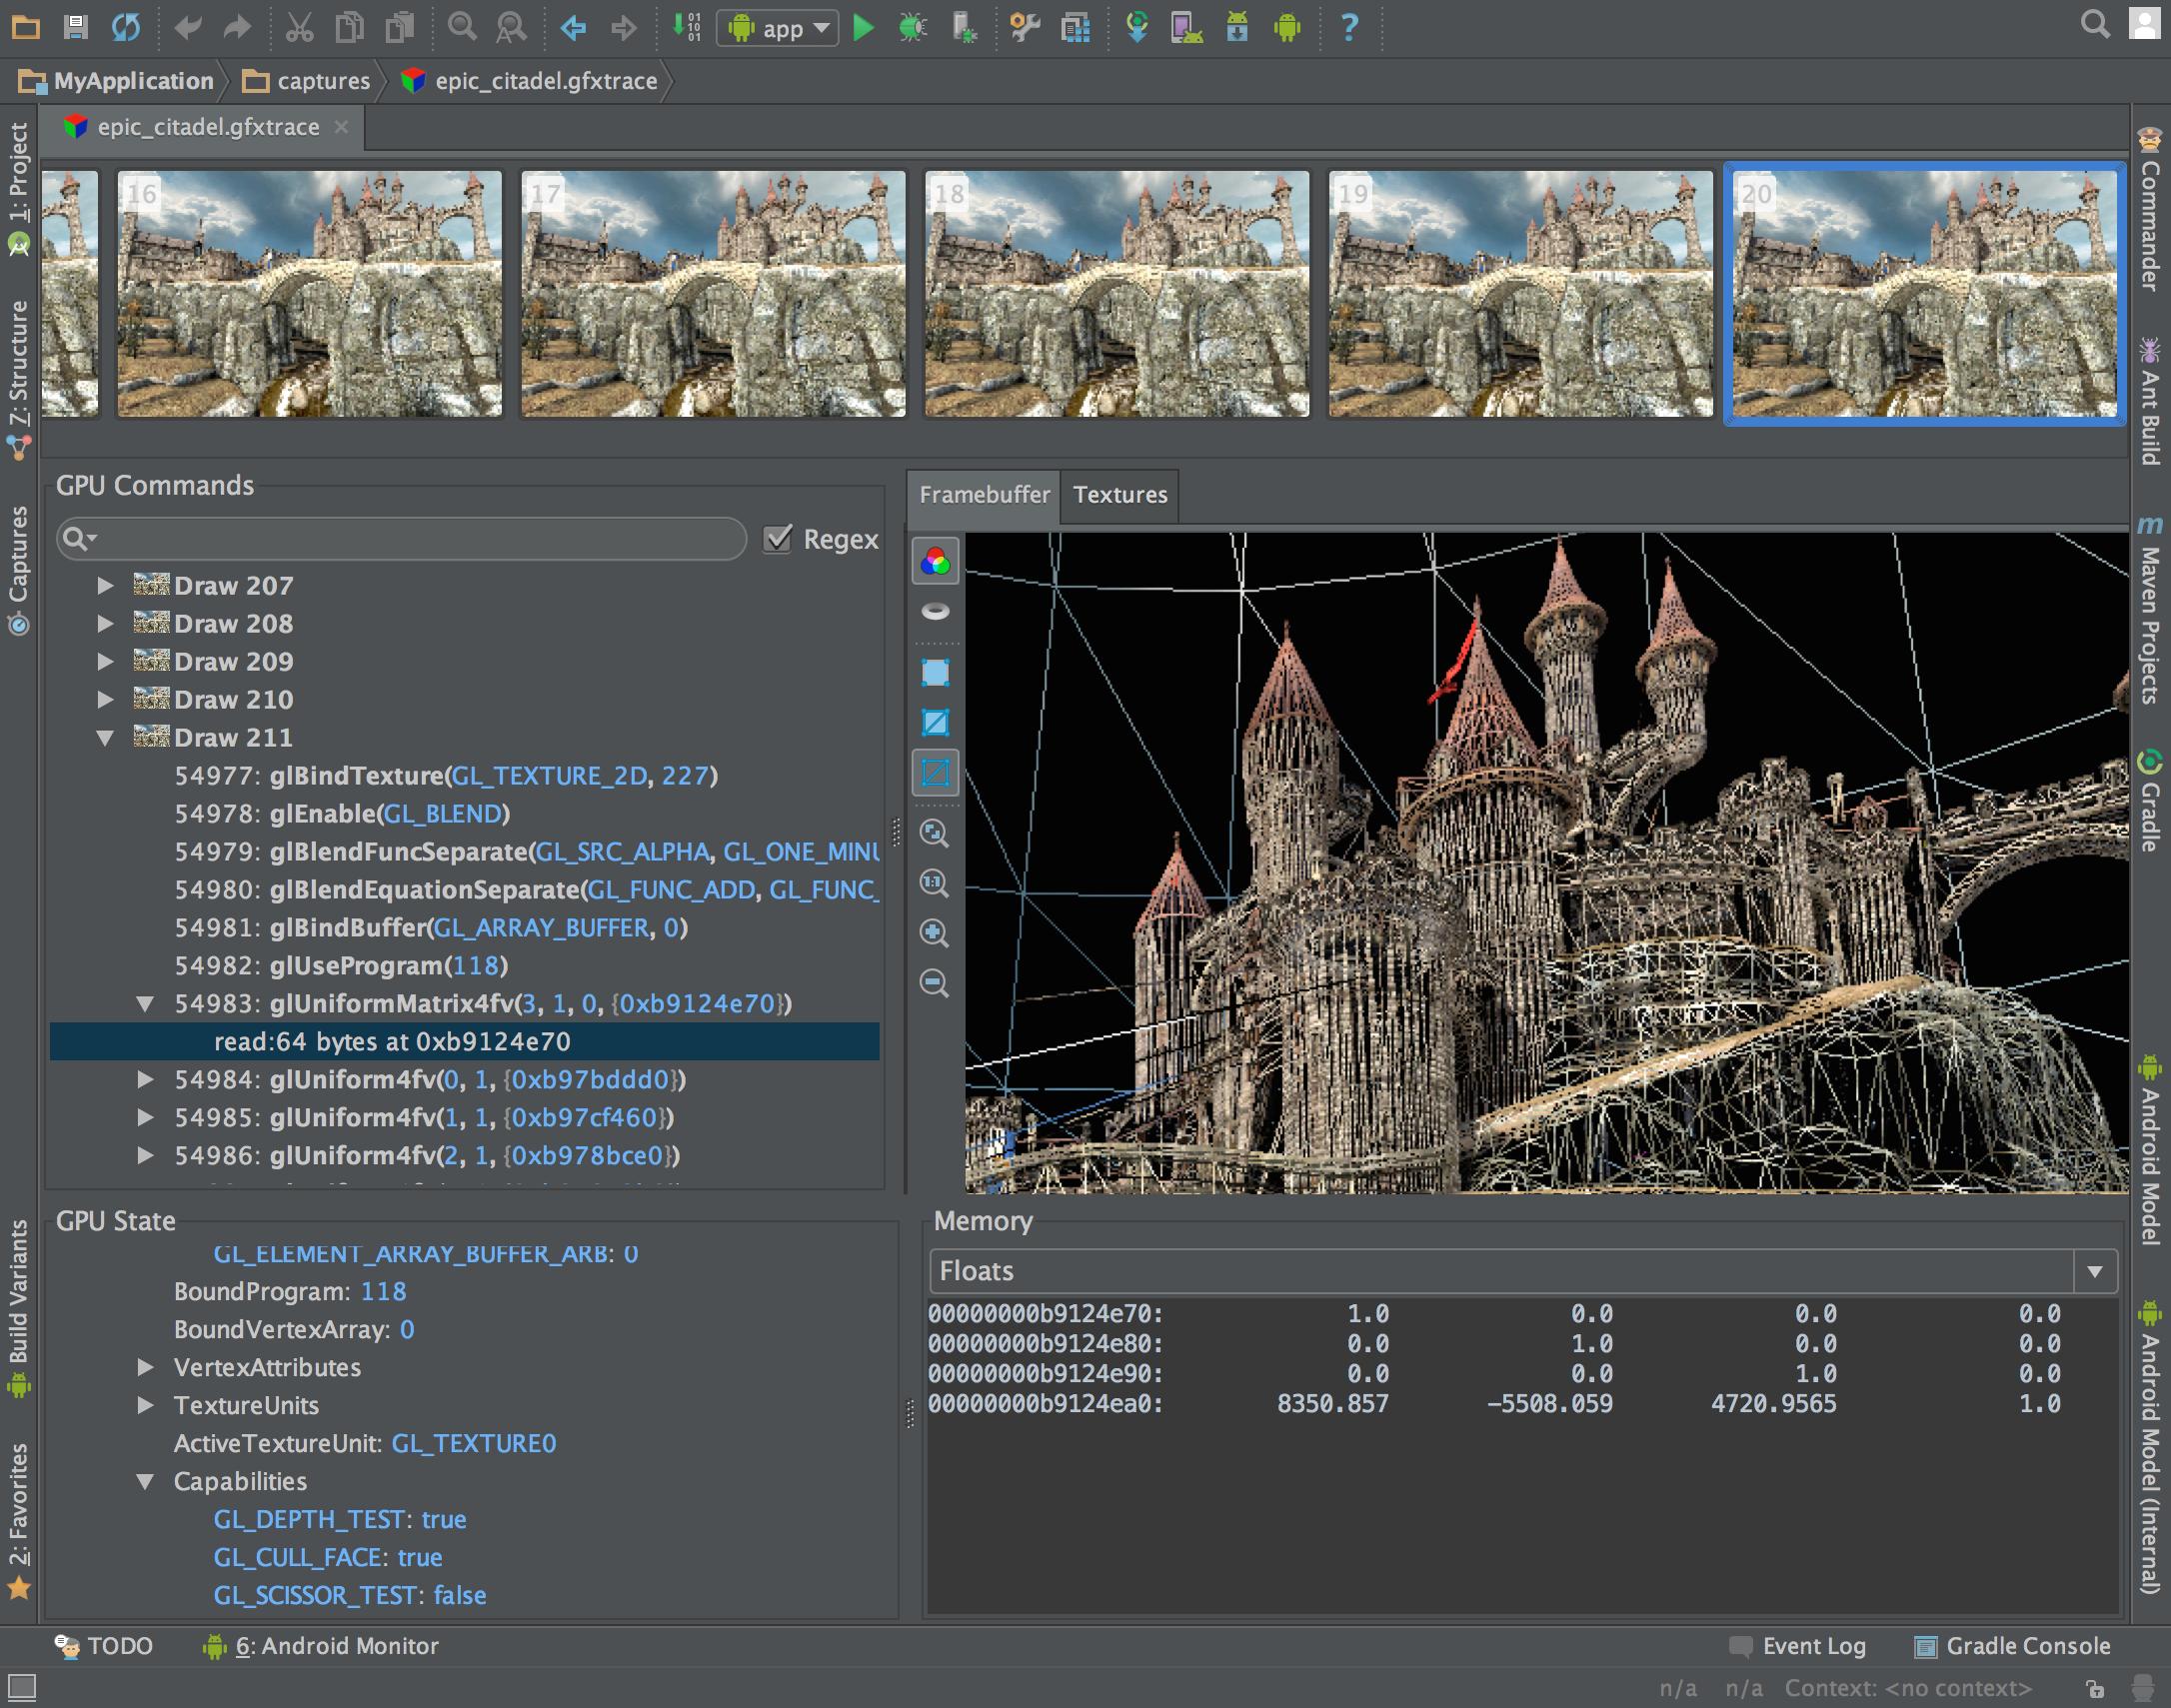 AndroidStudio2.0_GPUProfiler_Preview